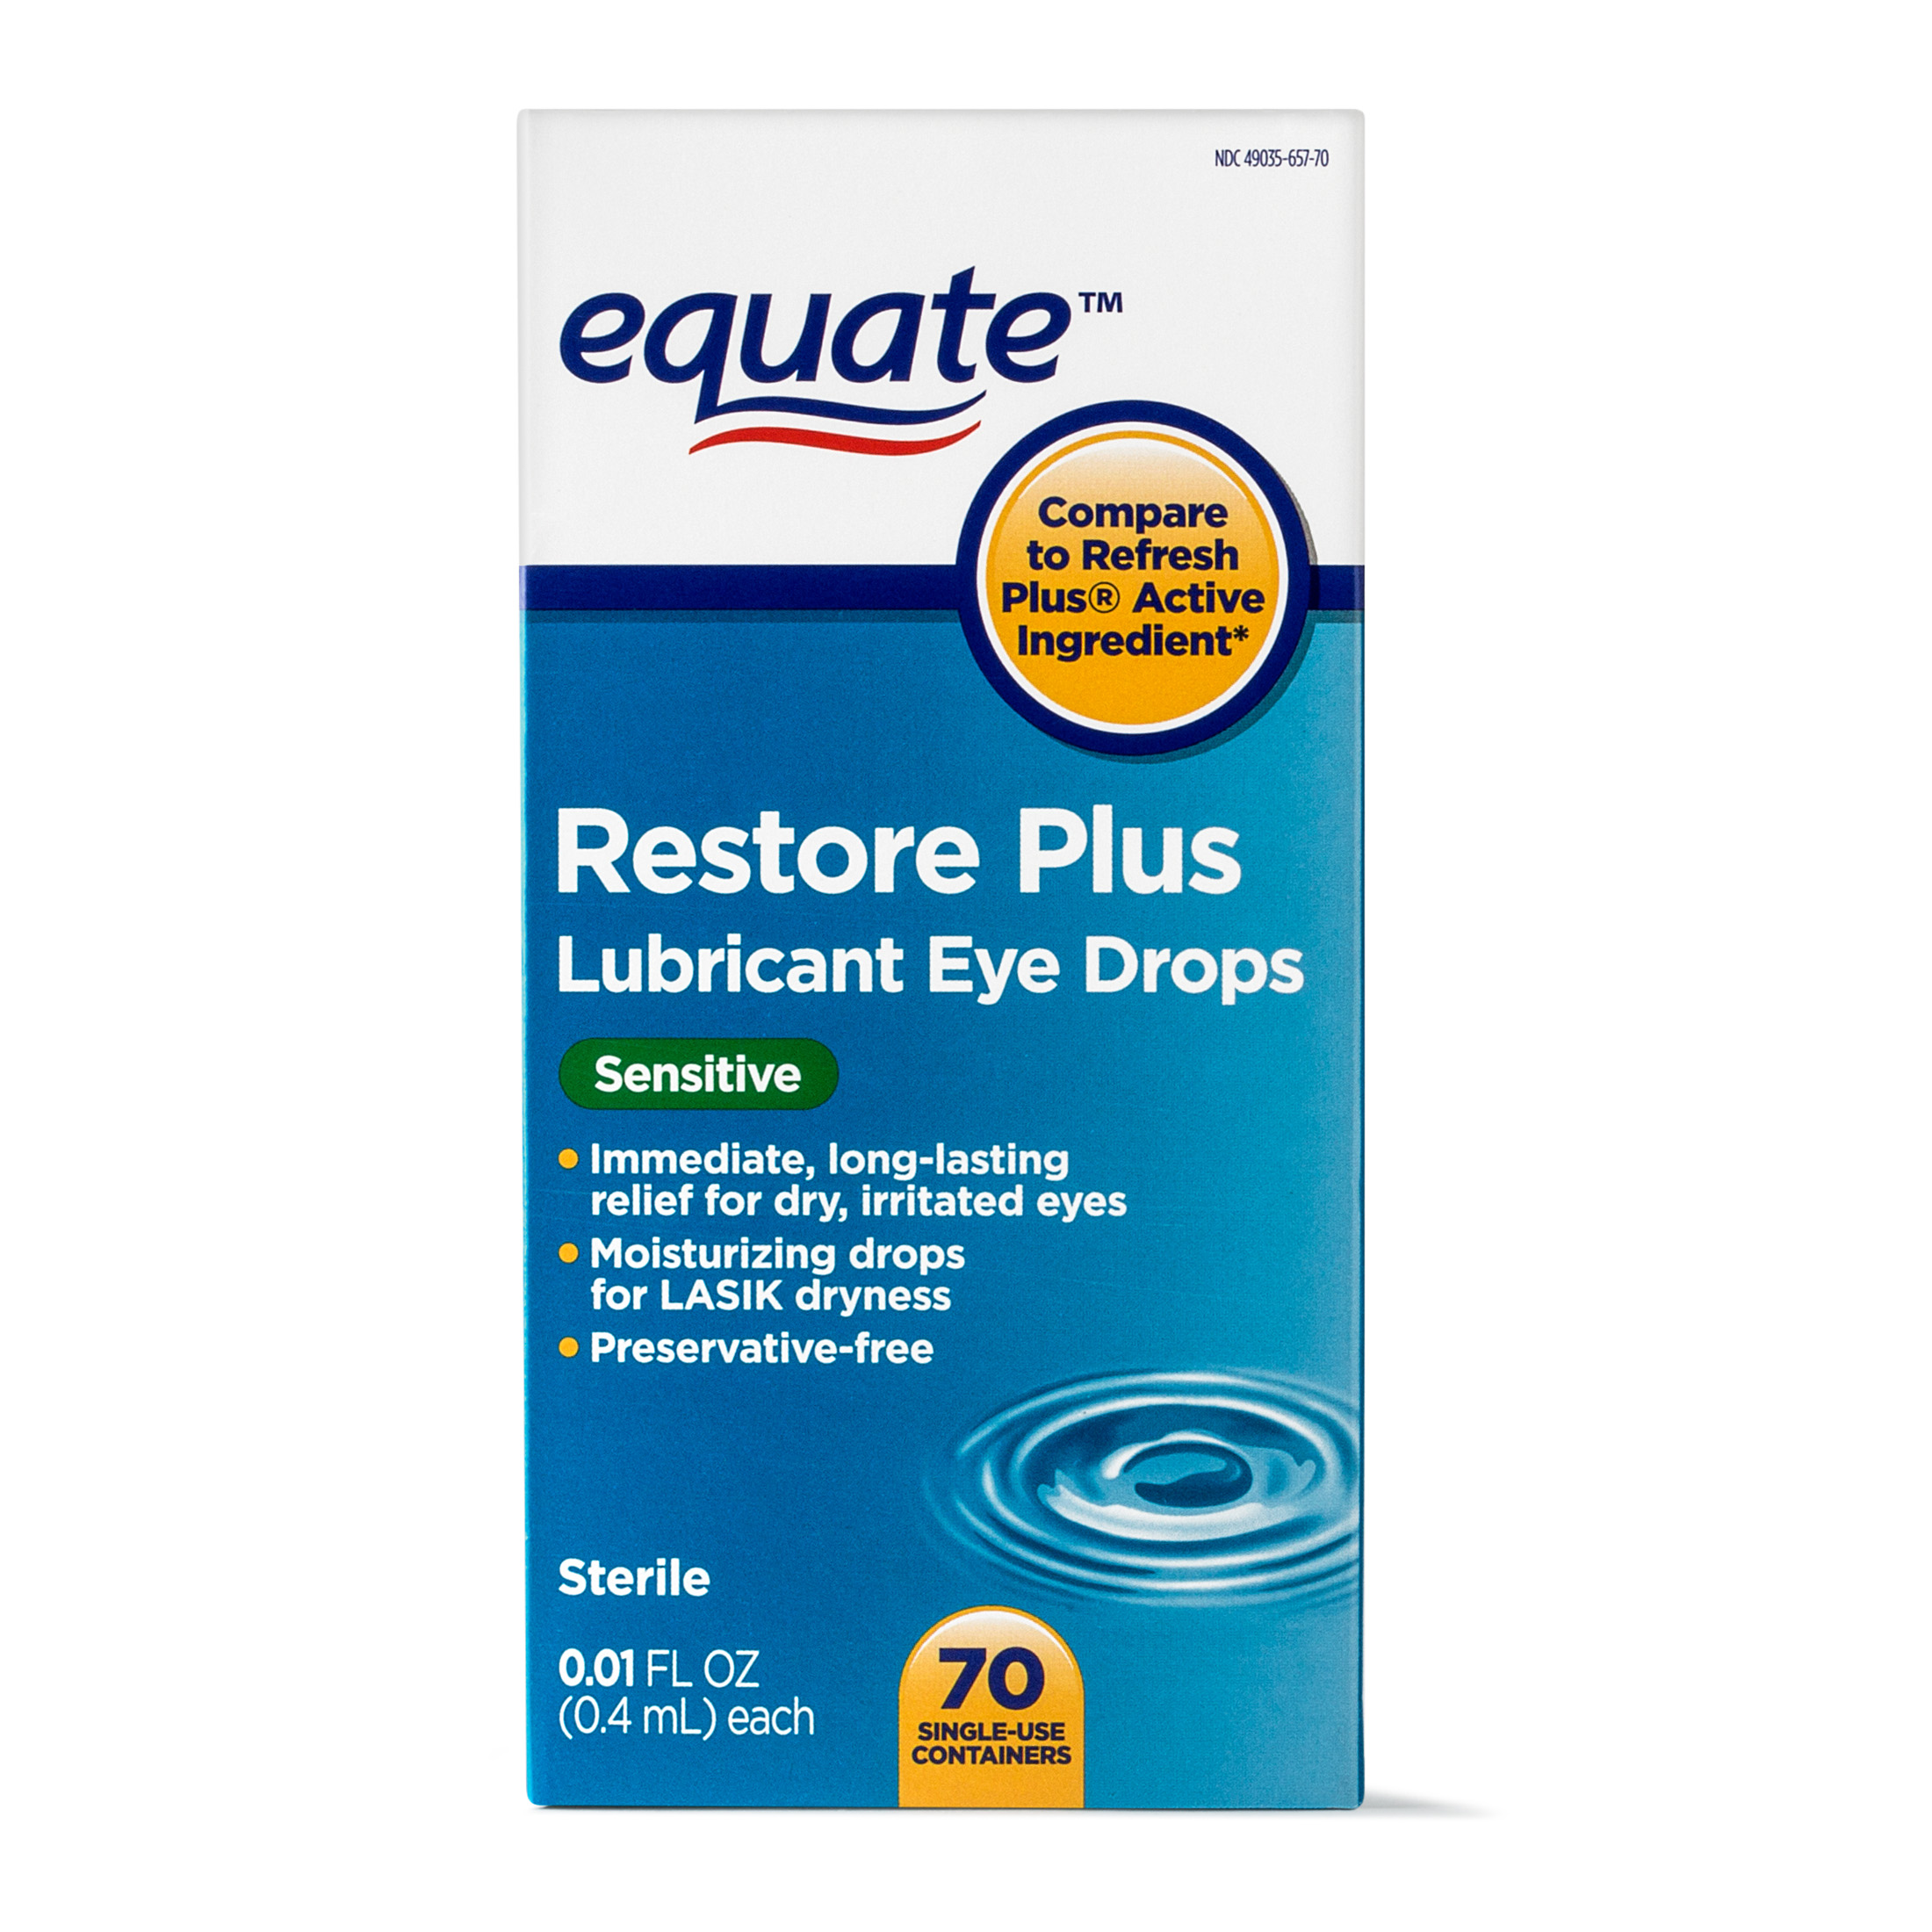 Equate Sensitive Restore Plus Lubricant Eye Drops ...